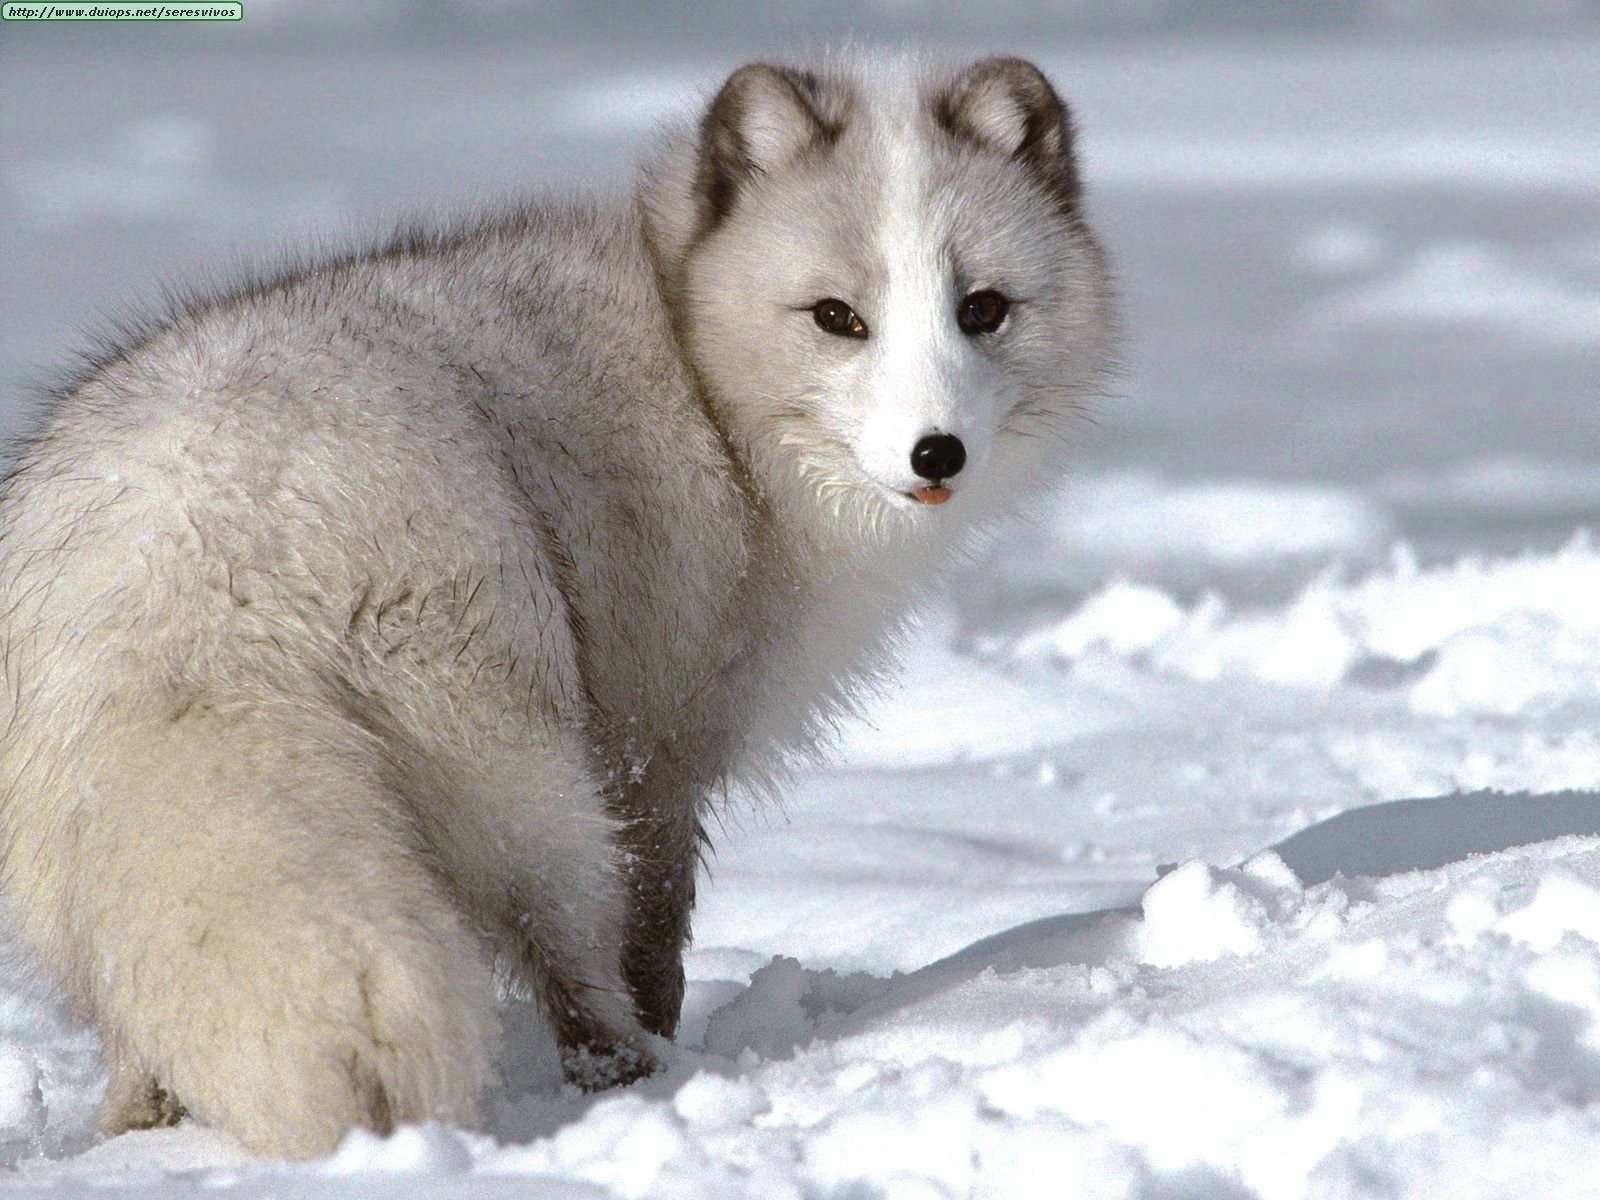 http://1.bp.blogspot.com/-T6aBYH5Uxn8/Tc_fpHpTQXI/AAAAAAAAHOE/WkNrNT9zDp0/s1600/arctic-fox-wallpaper.jpg